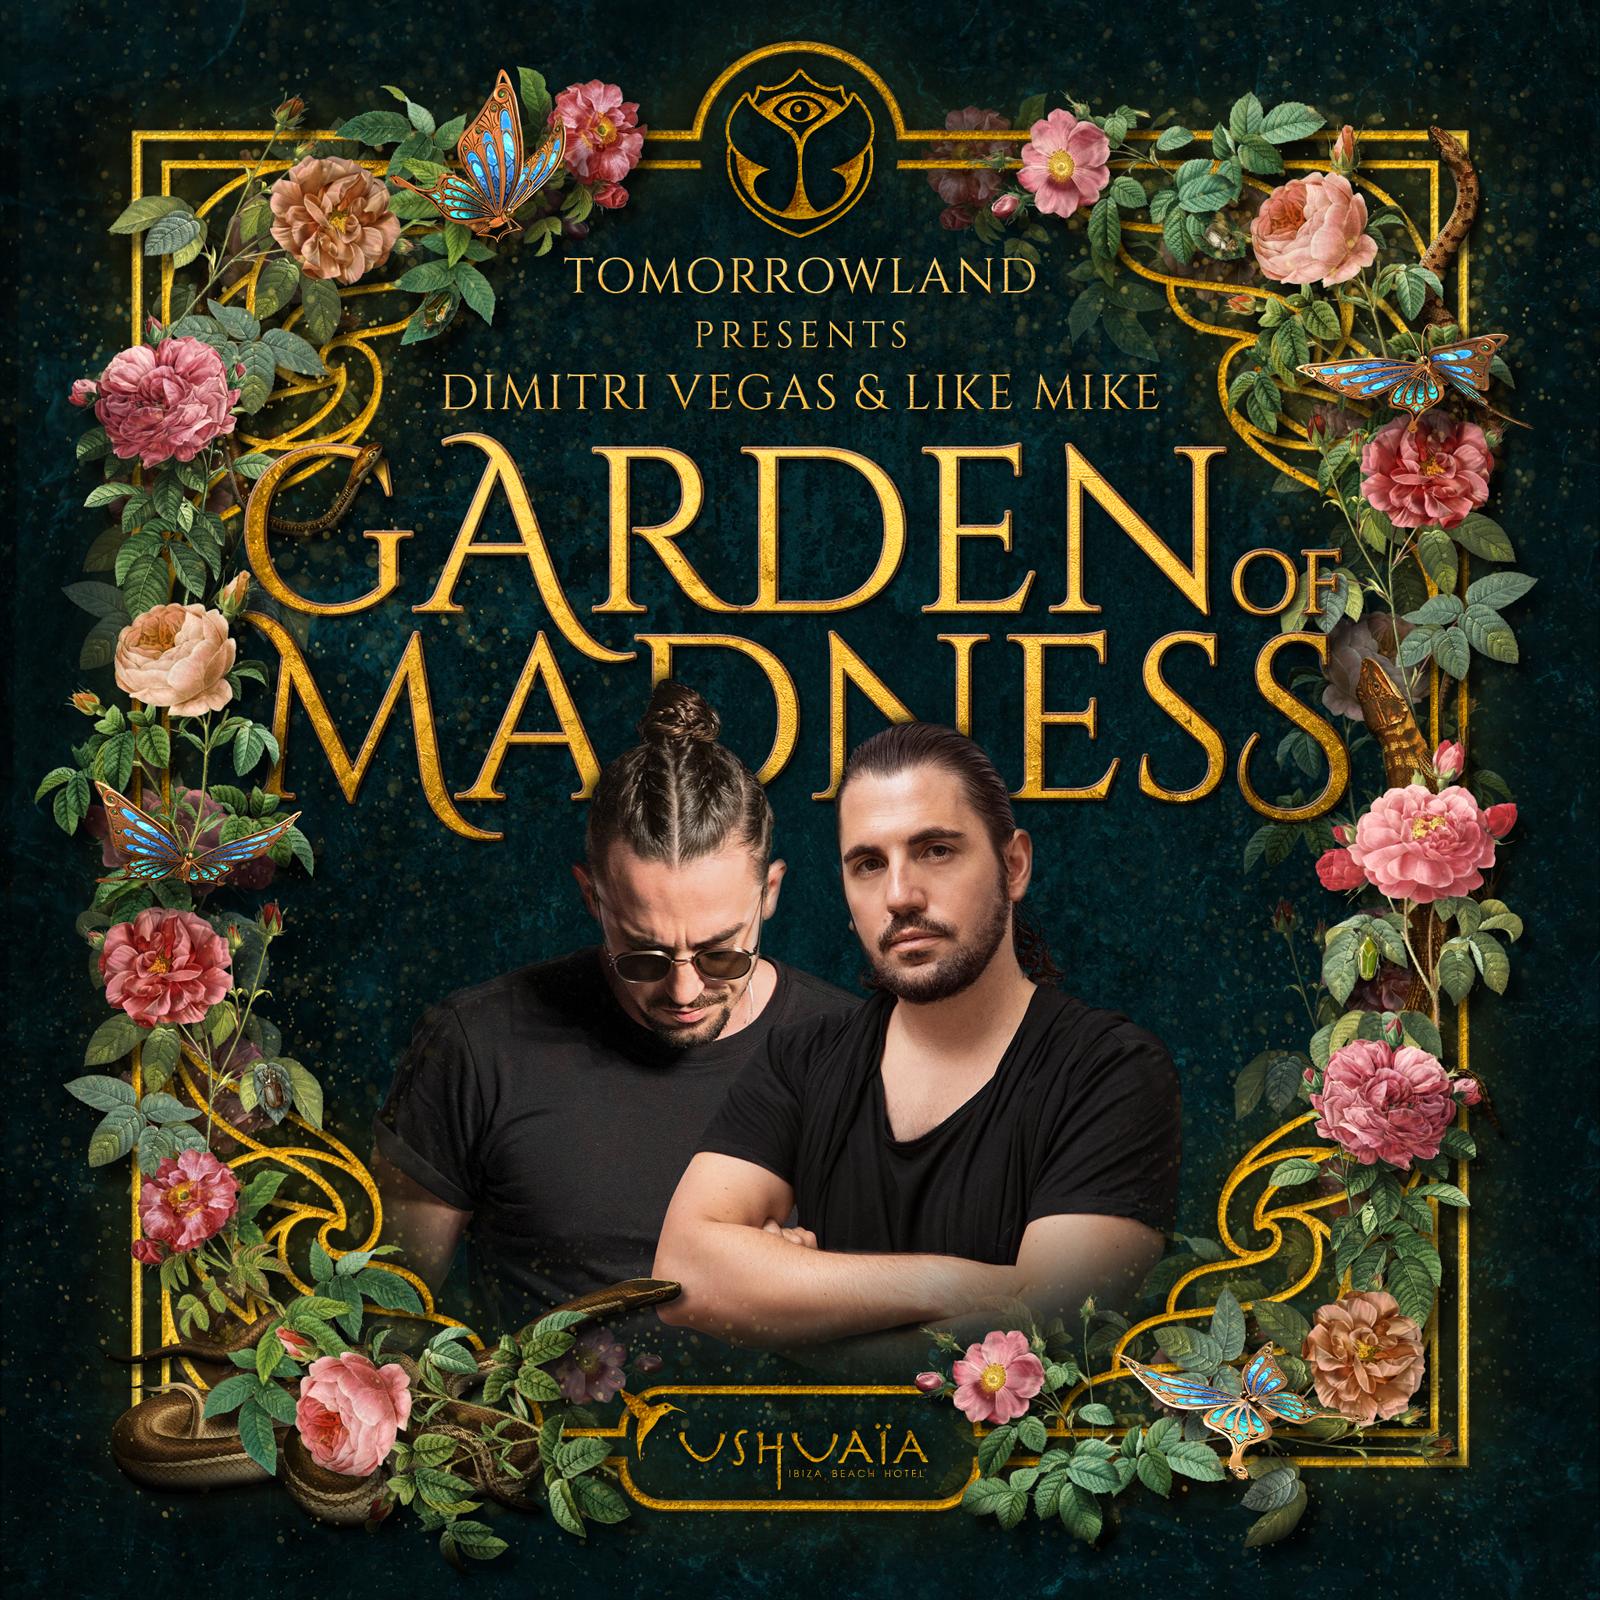 Garden of Madness - Dimitri Vegas e Like Mike